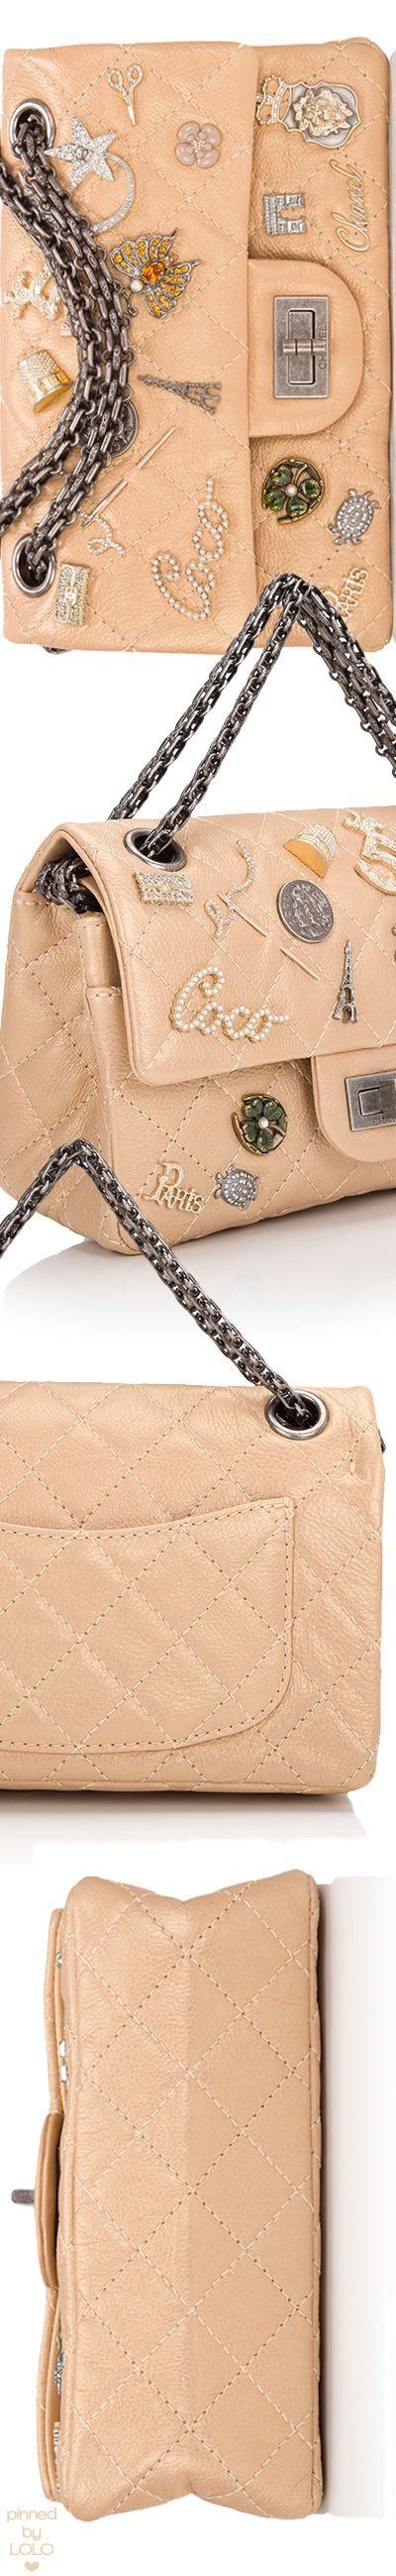 Chanel Runway Flap Bag